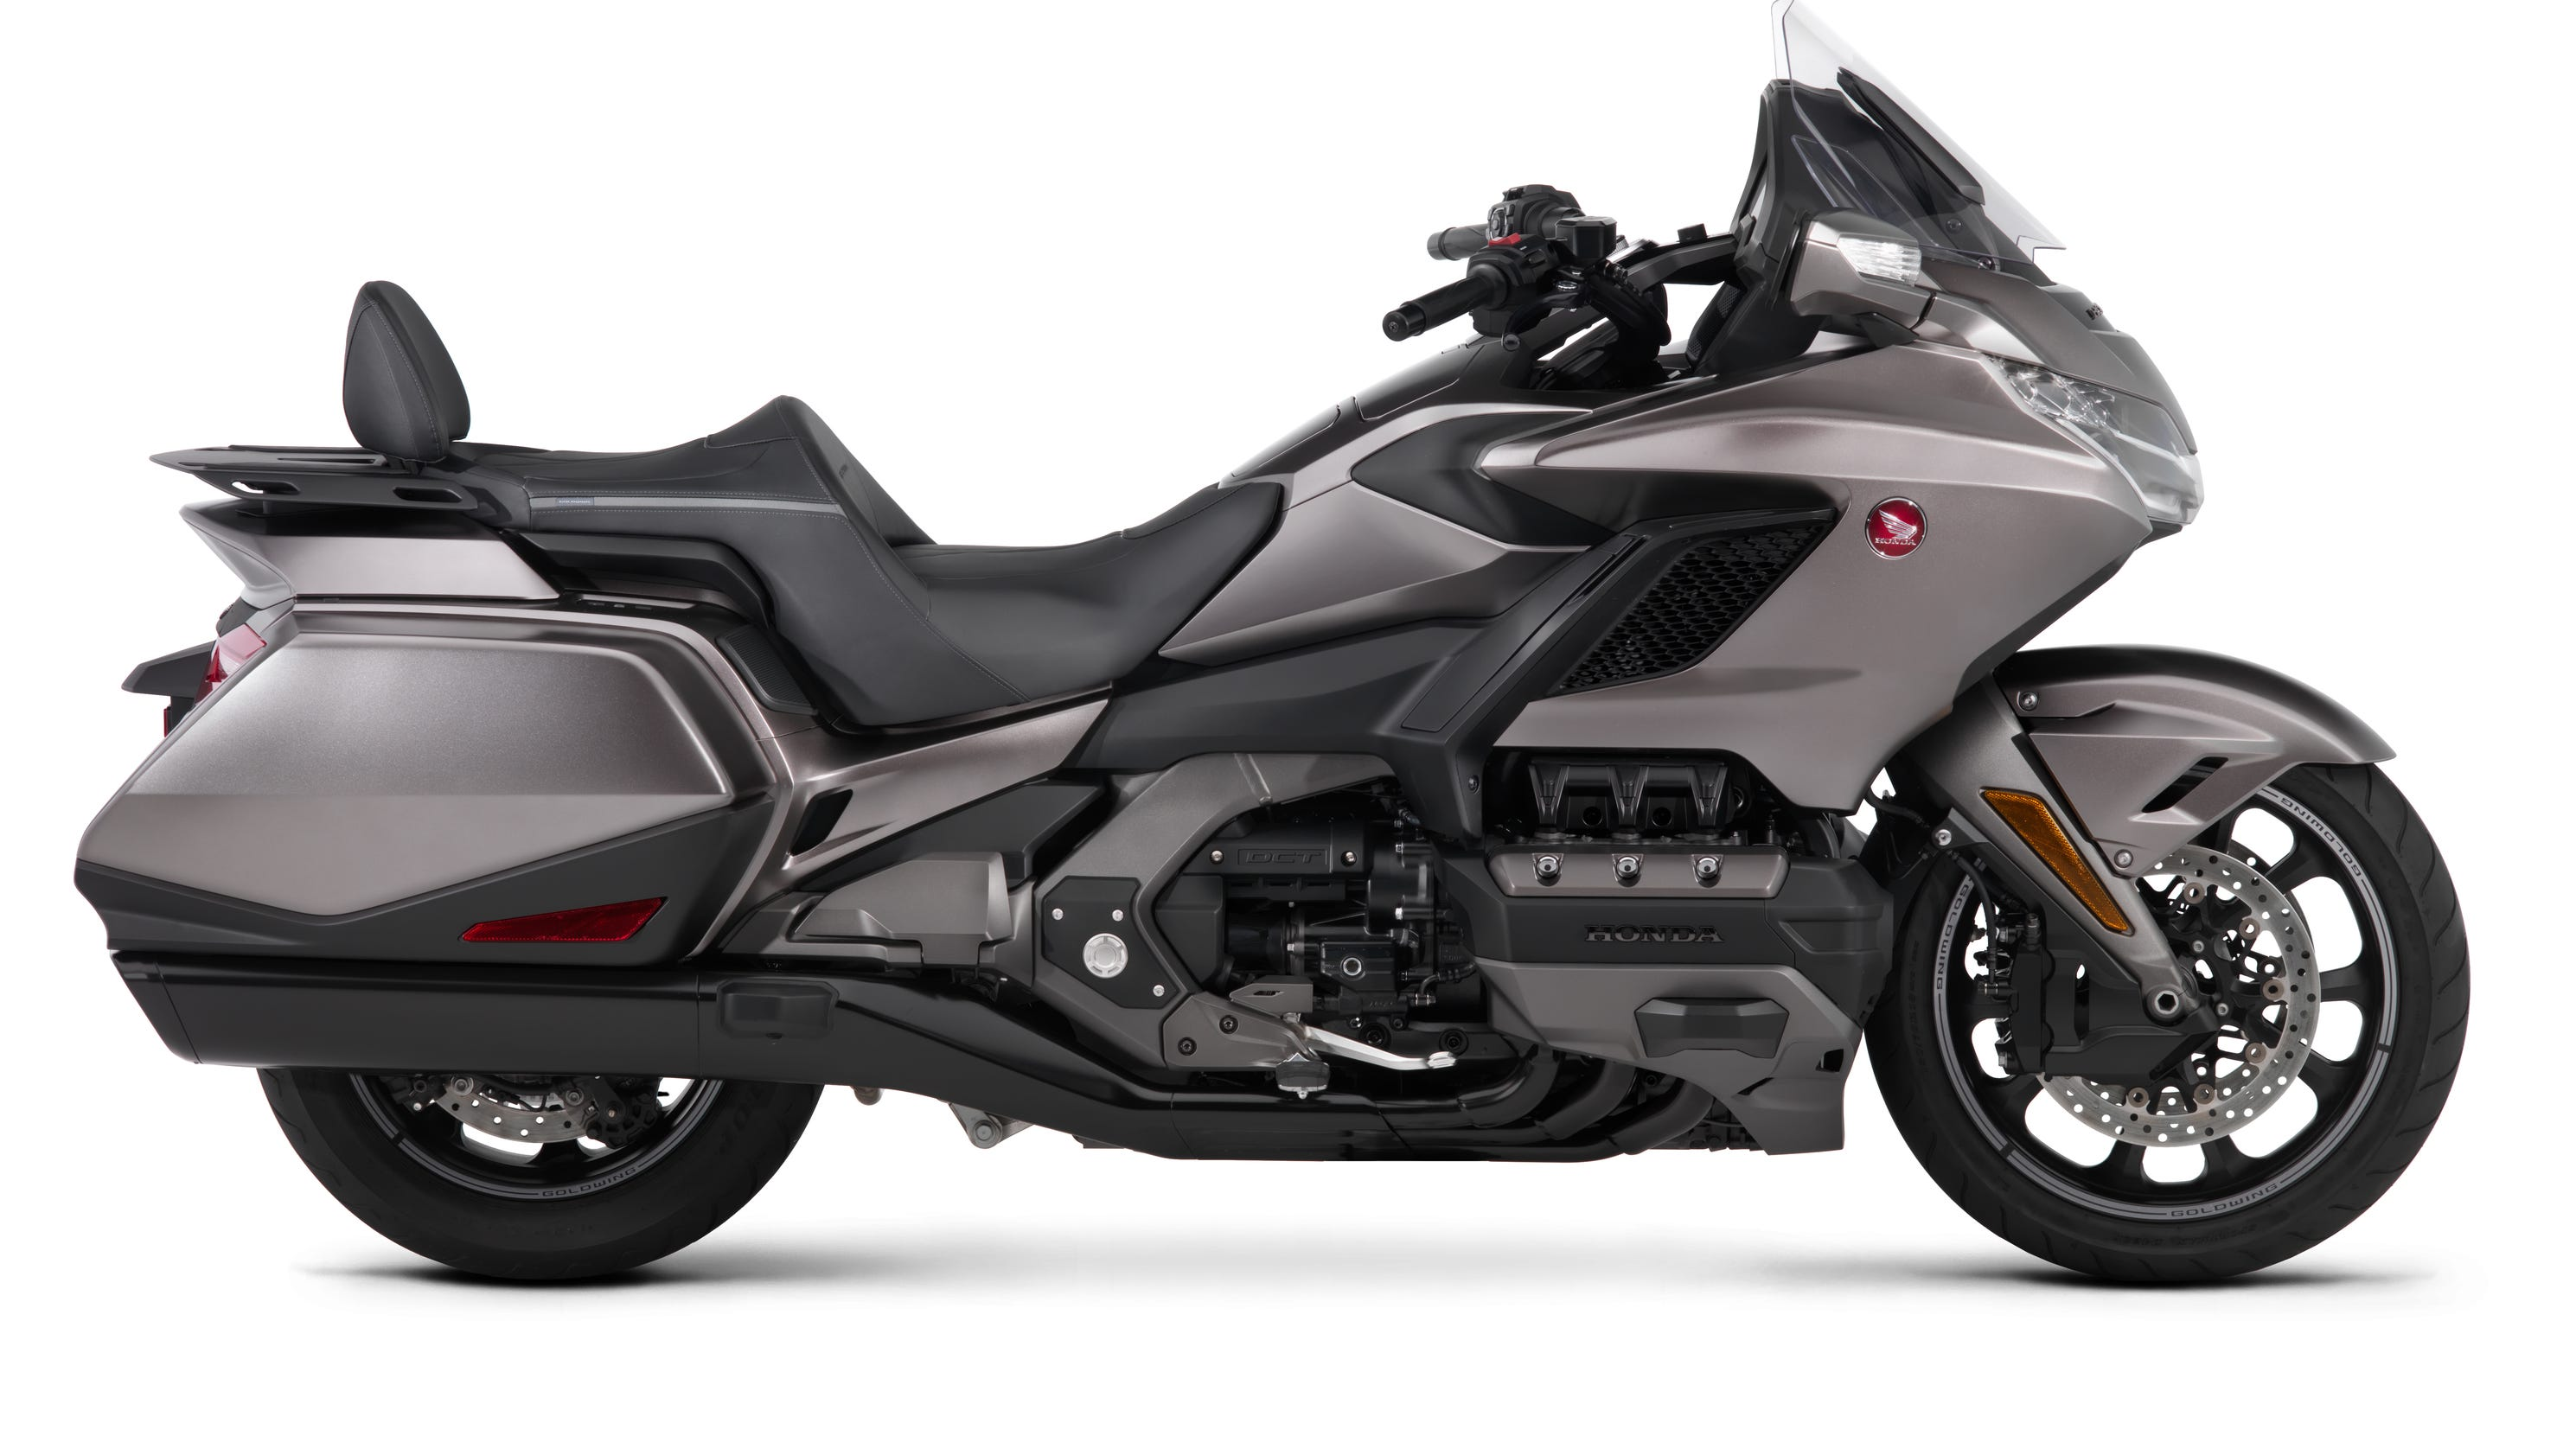 Honda Gold Wing motorcycles get lighter, new look